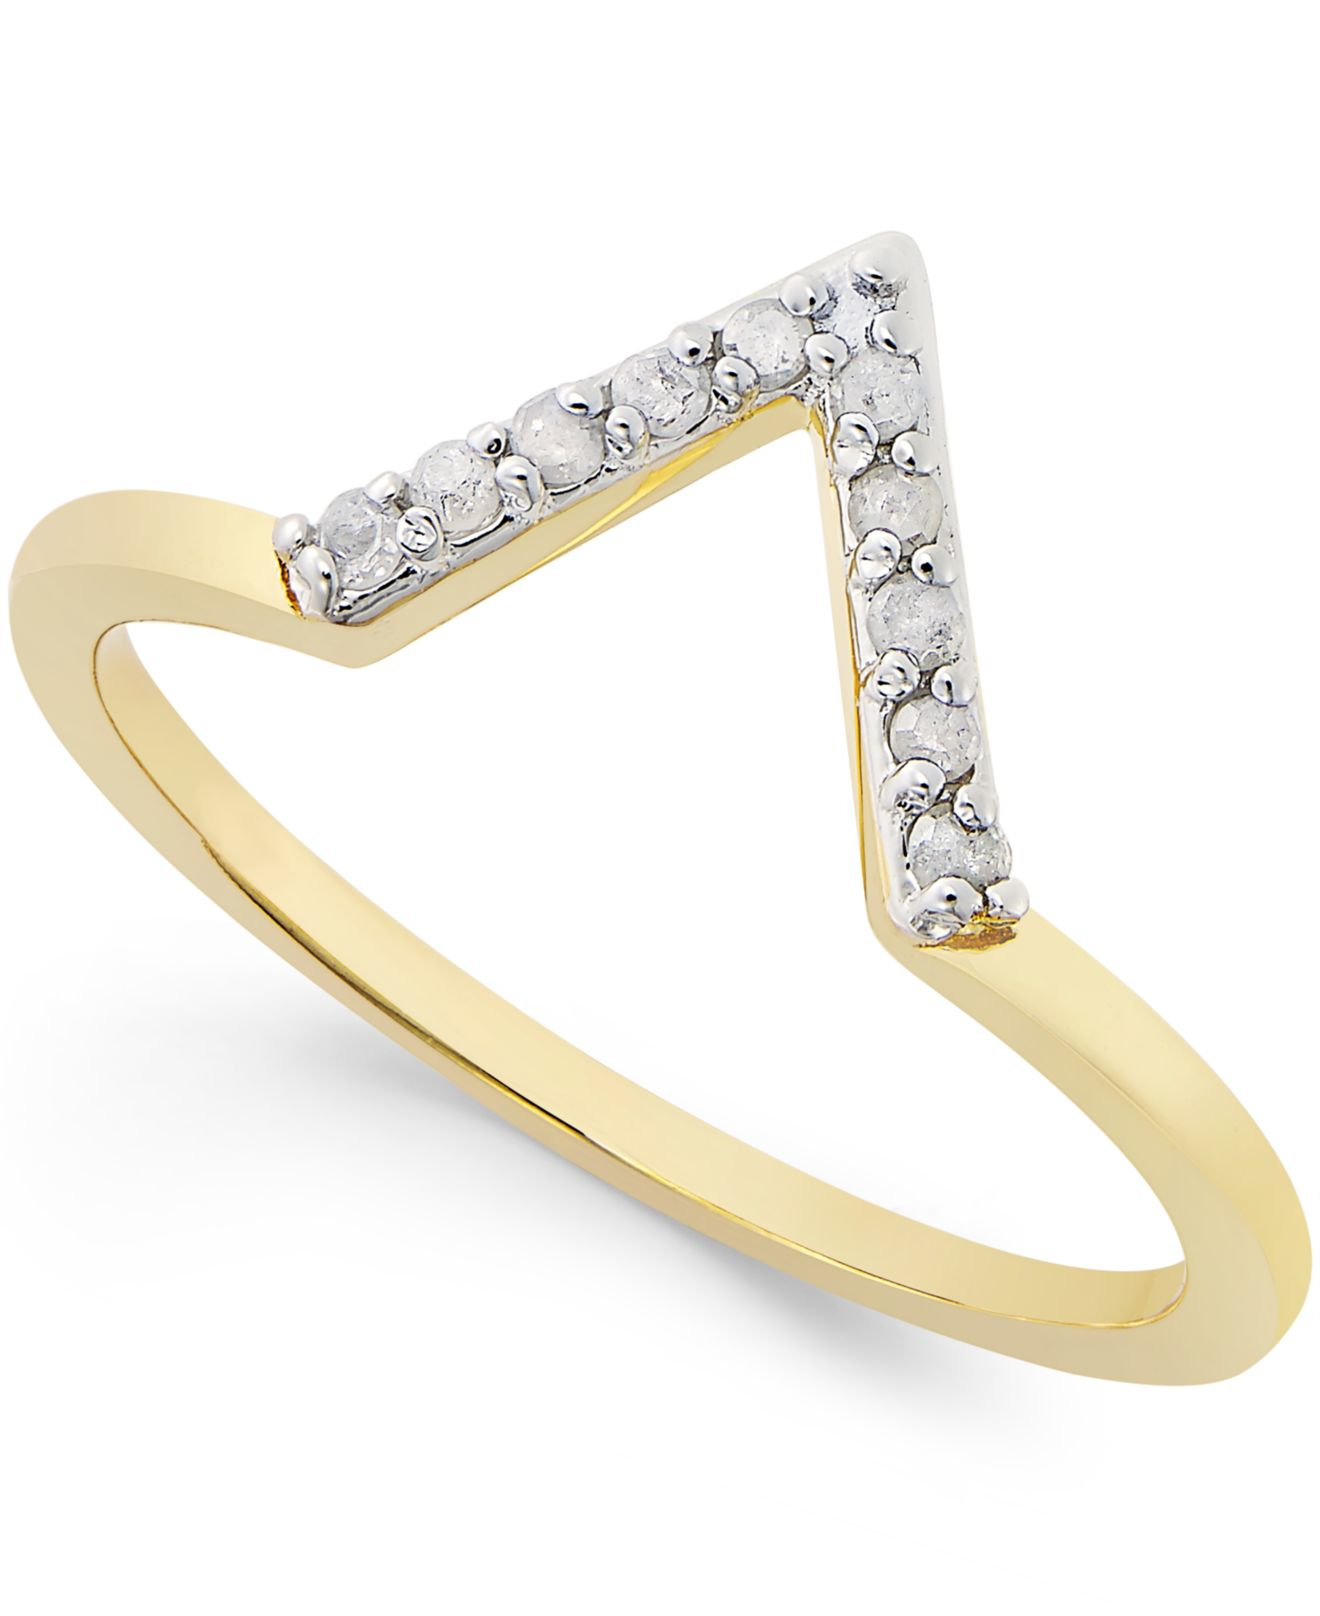 Macy s Diamond V Ring 1 10 Ct T w In Sterling Silver 18k Gold plat